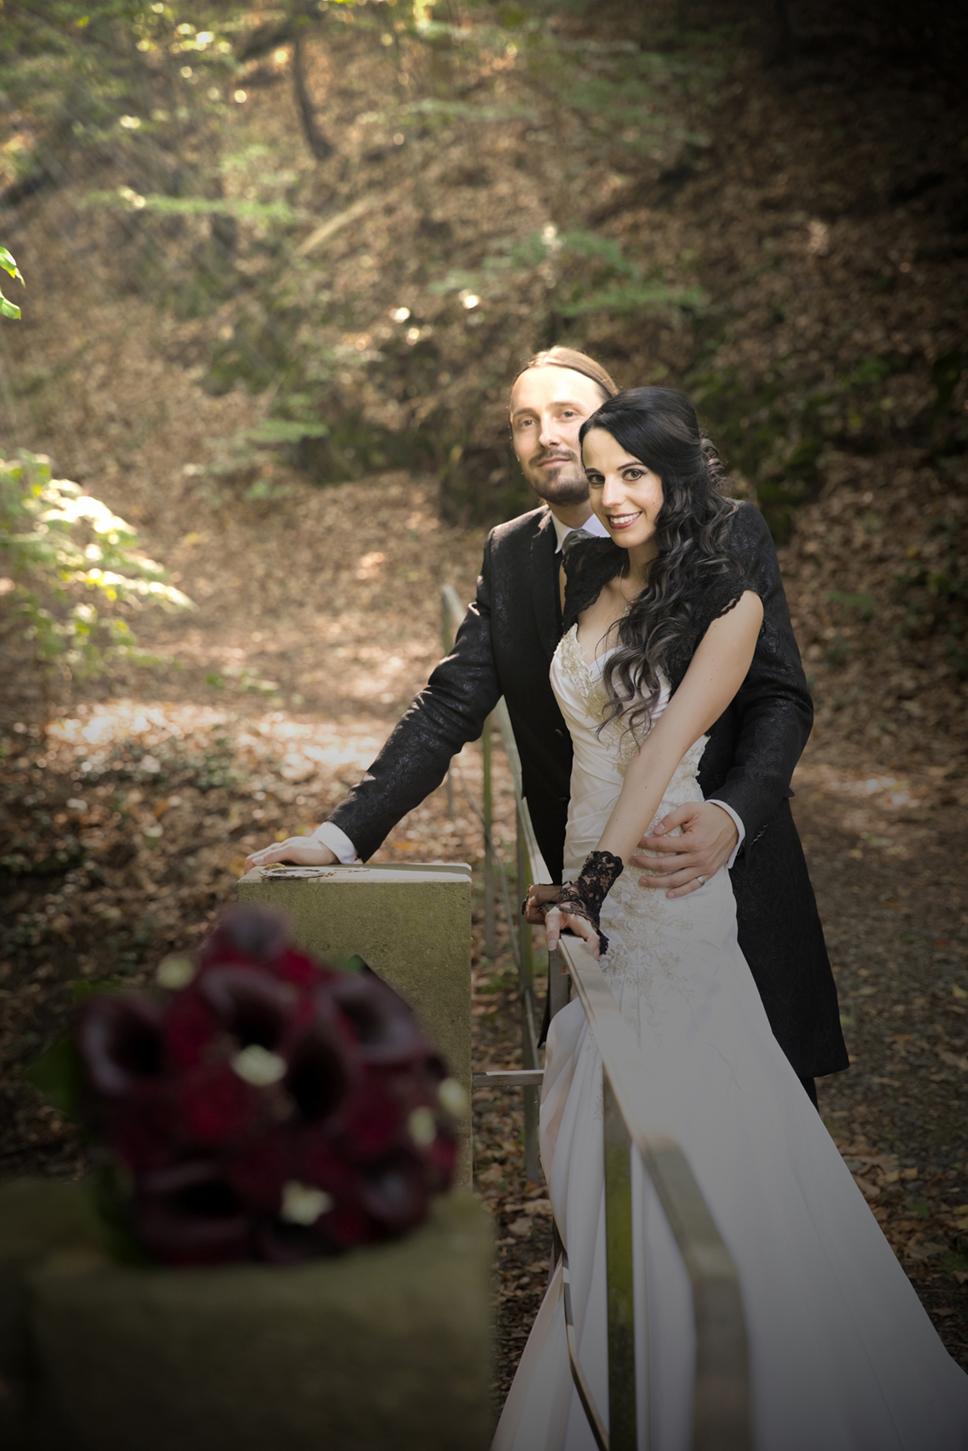 Myrelle_Couture_Marina_Deynega_Hochzeit_Brautmode_kunden13 (3)